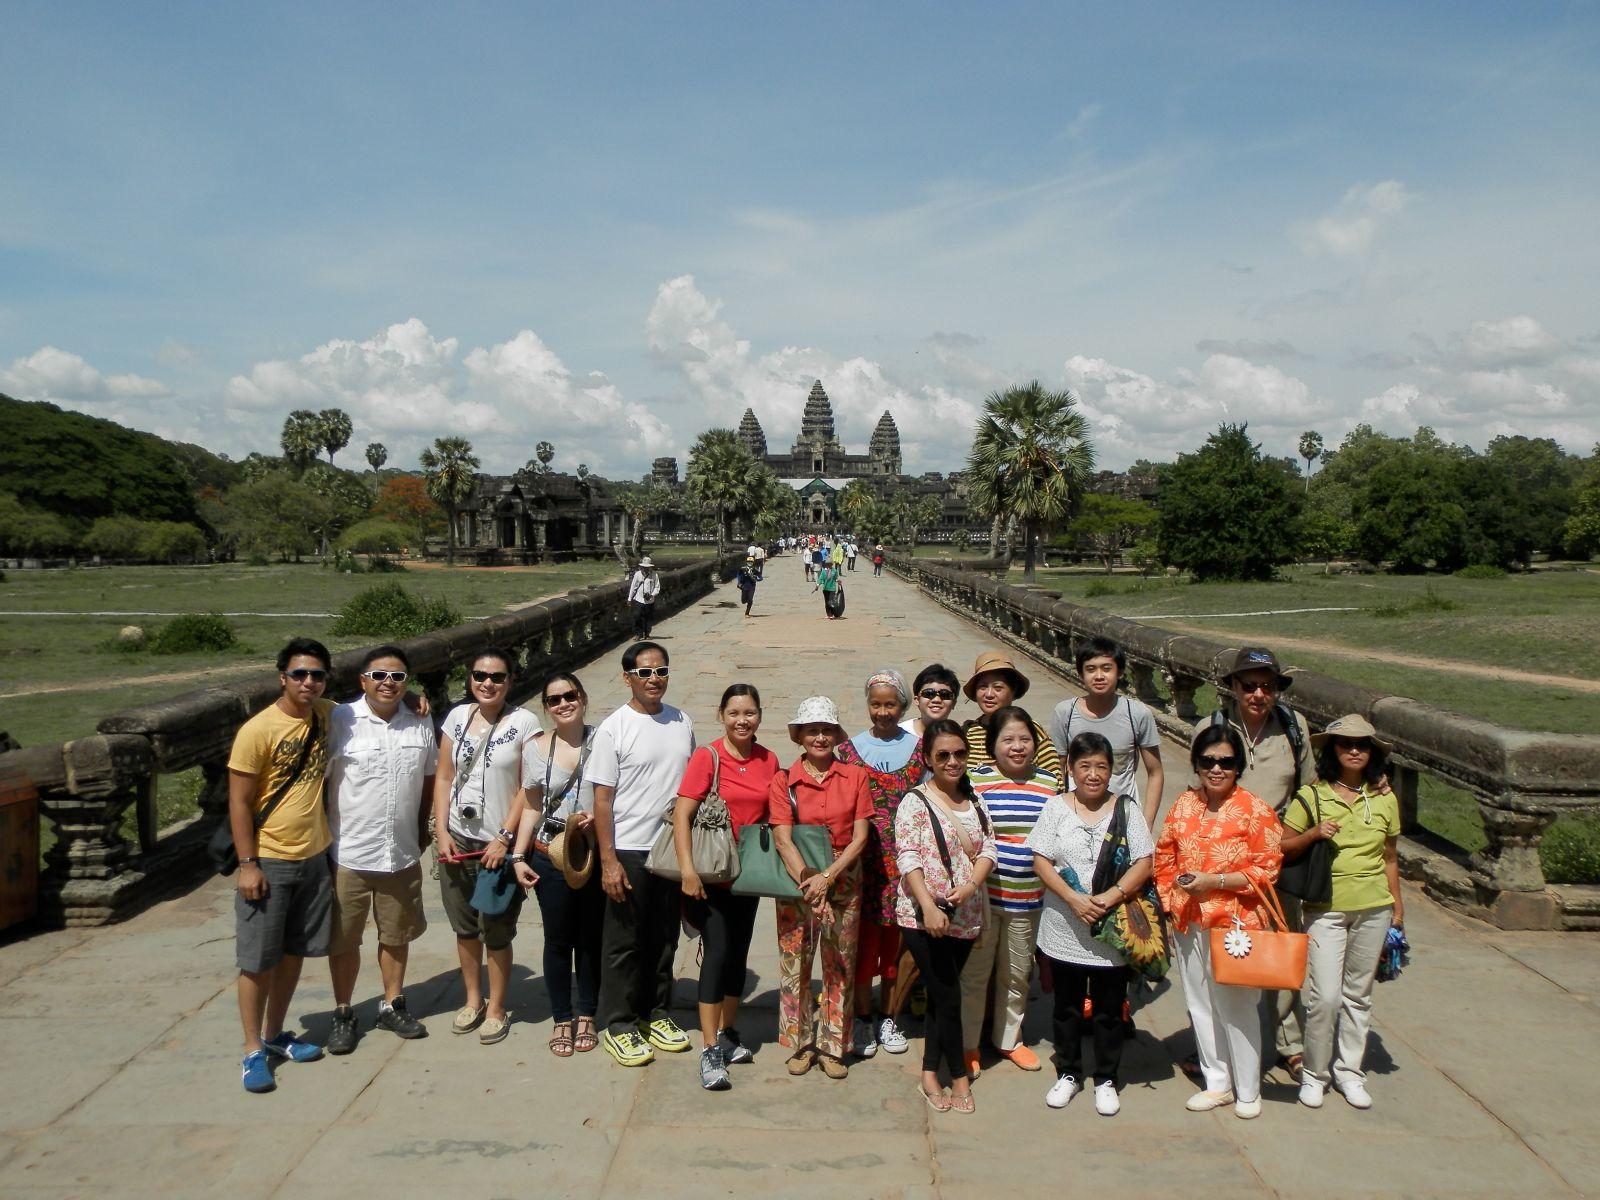 Asian philippine tour travel